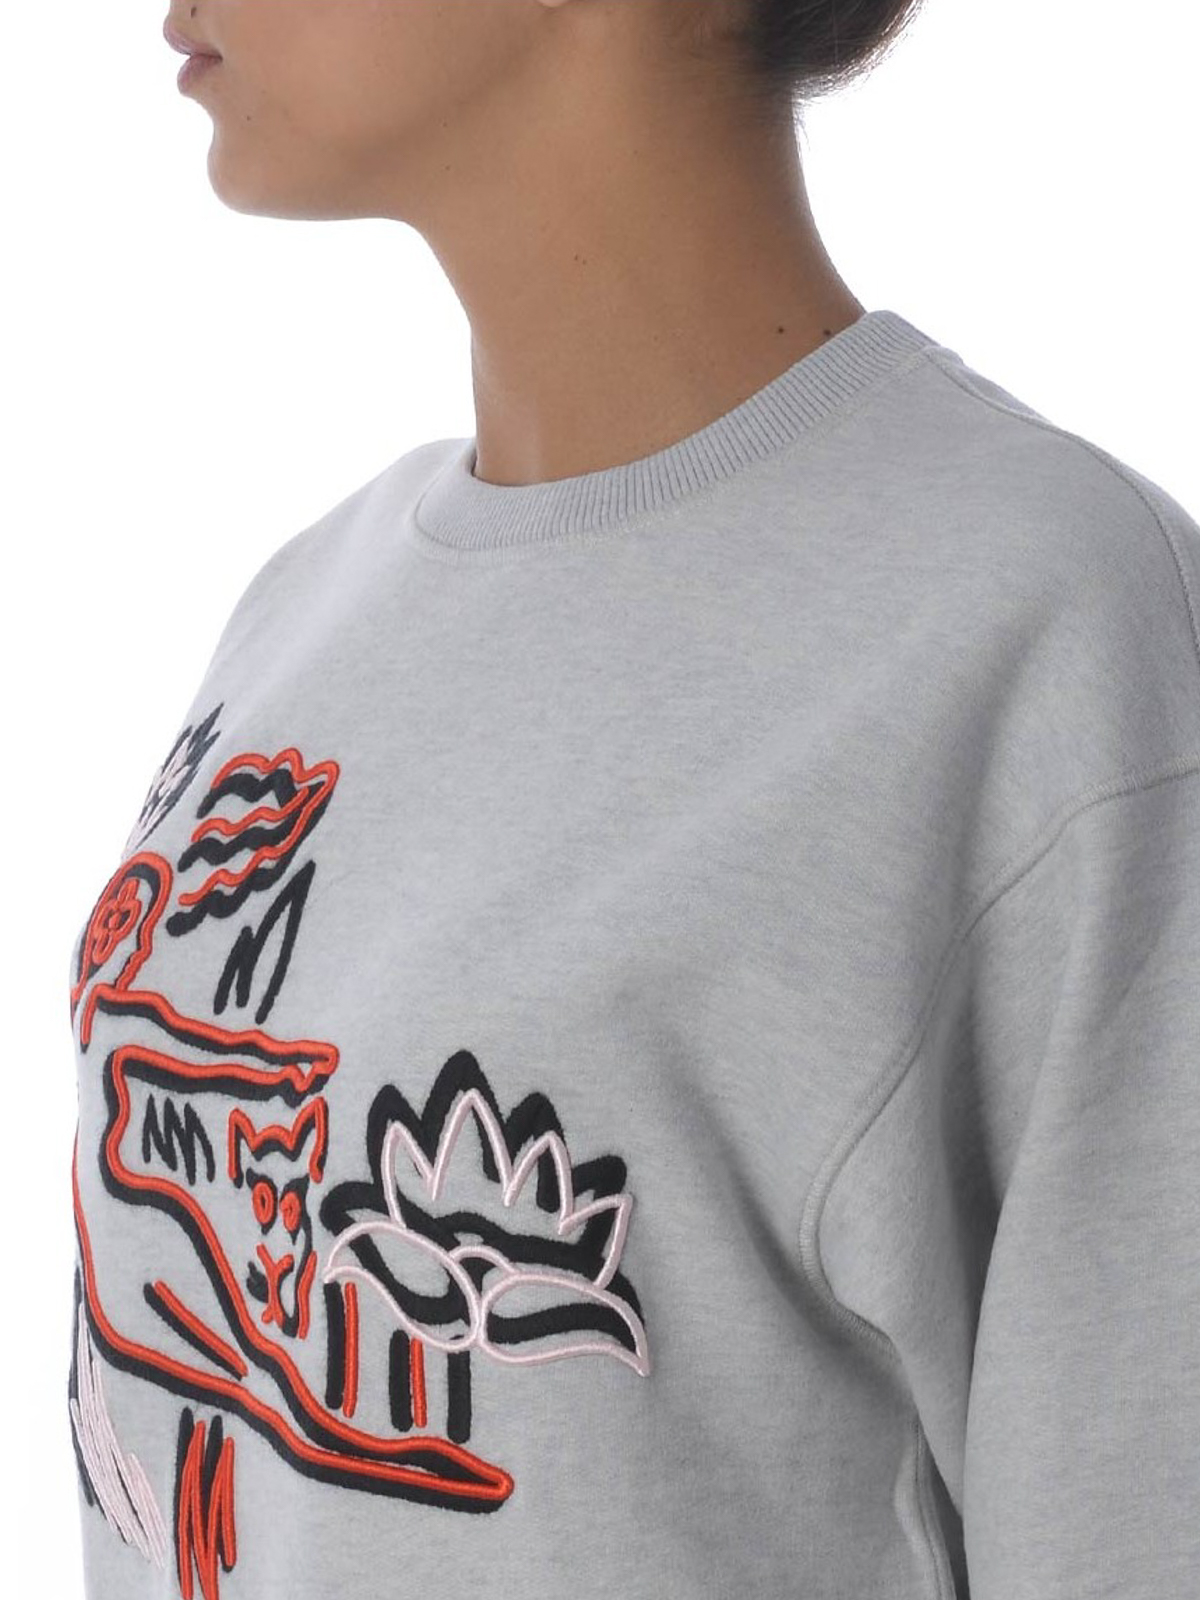 Kenzo Felpa in cotone con ricami Sketch Felpe e maglie